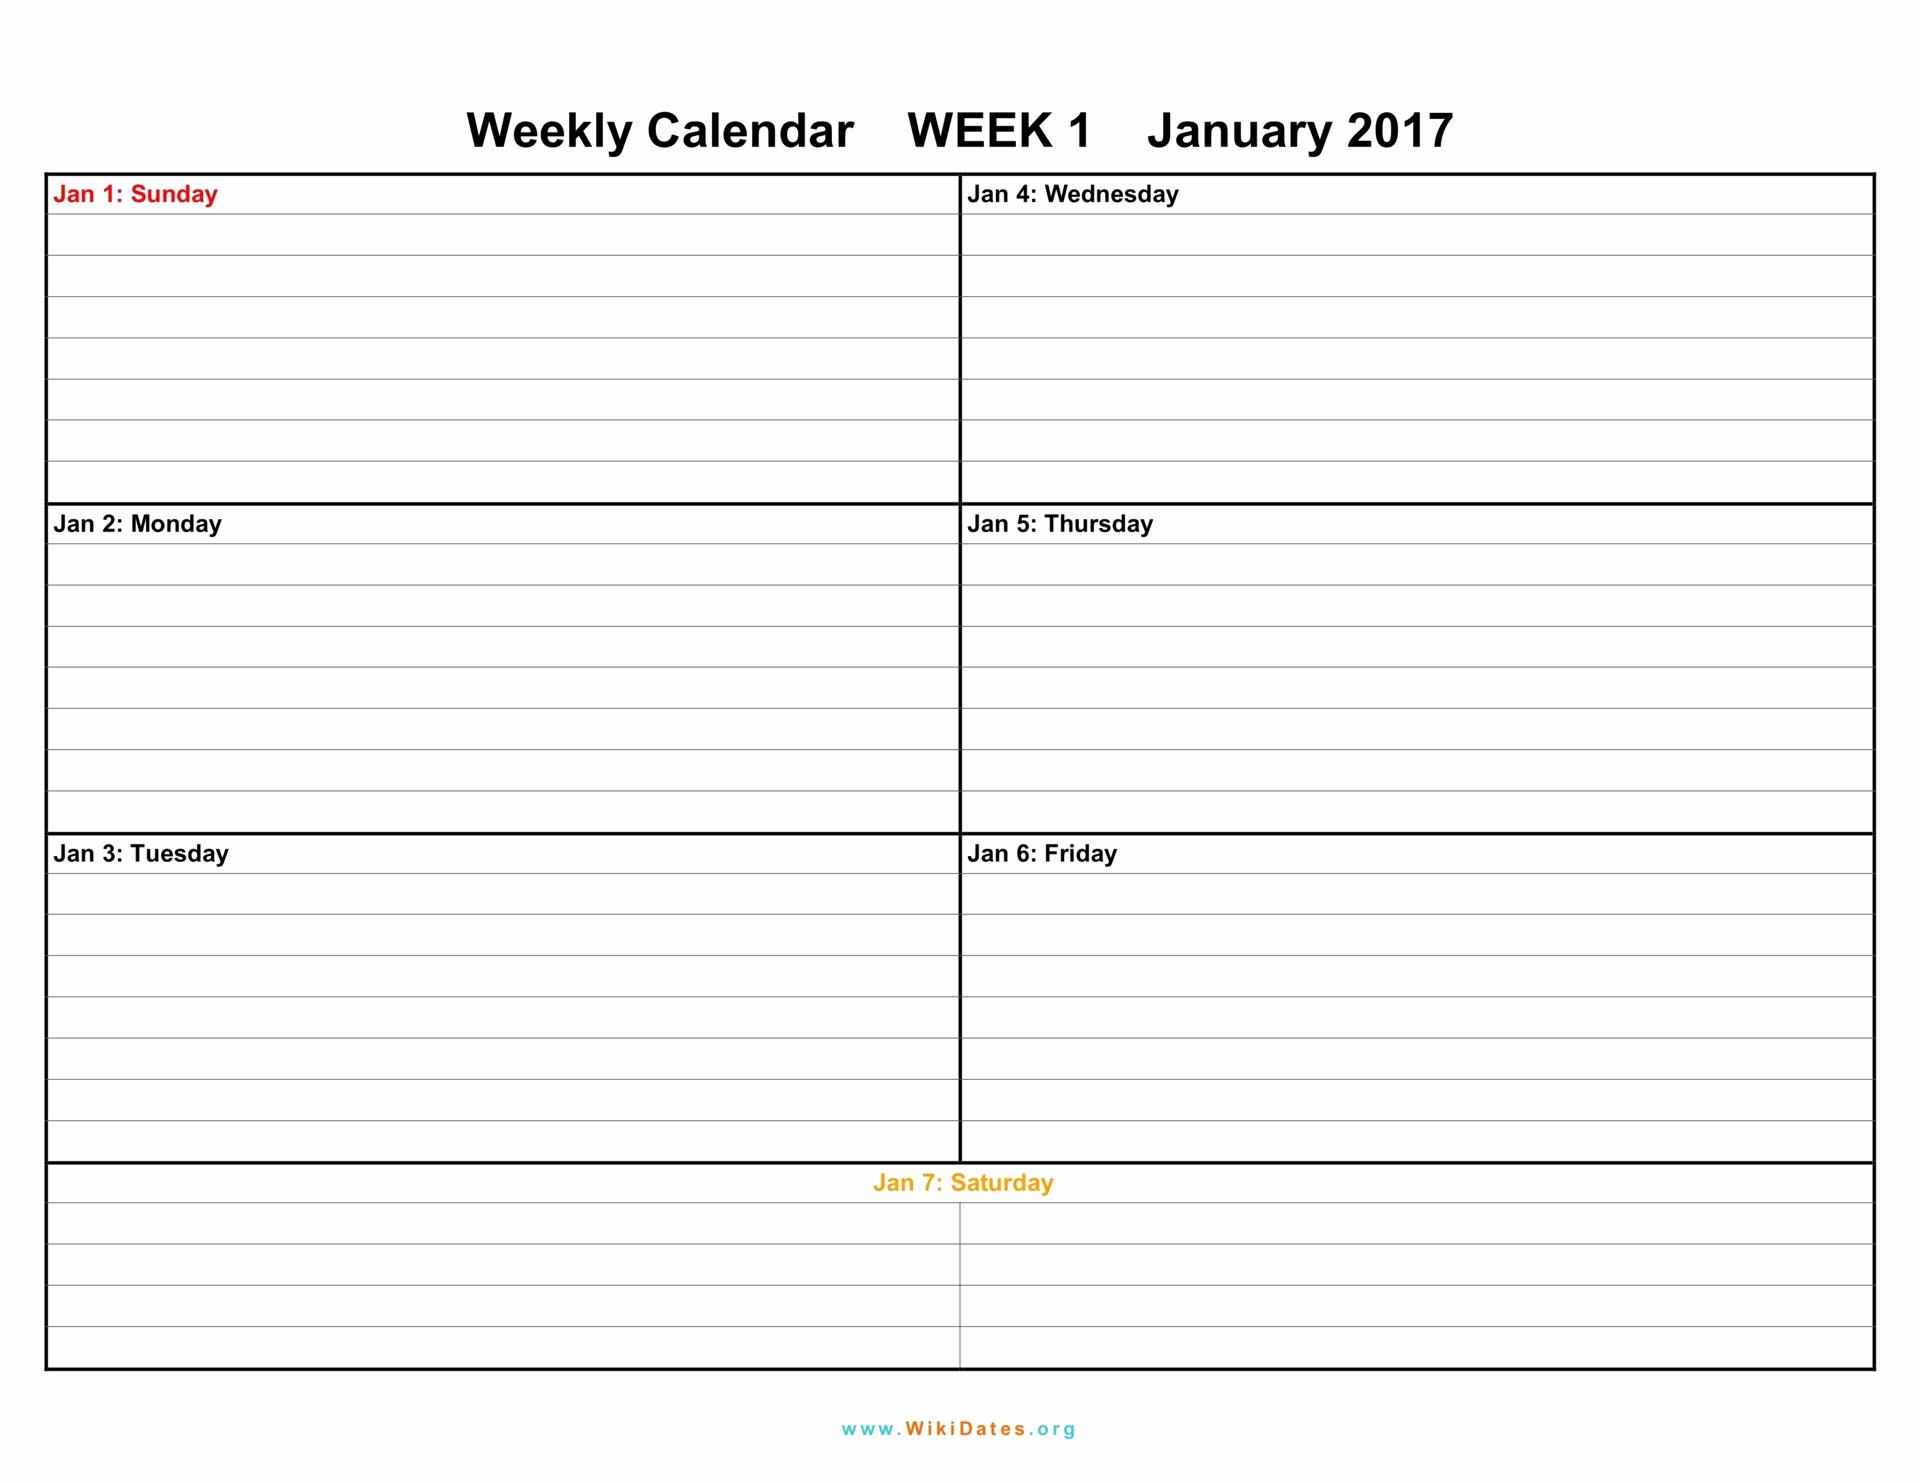 Weekly Schedule Template Printable Lovely Weekly Calendar Download Weekly Calendar 2017 and 2018